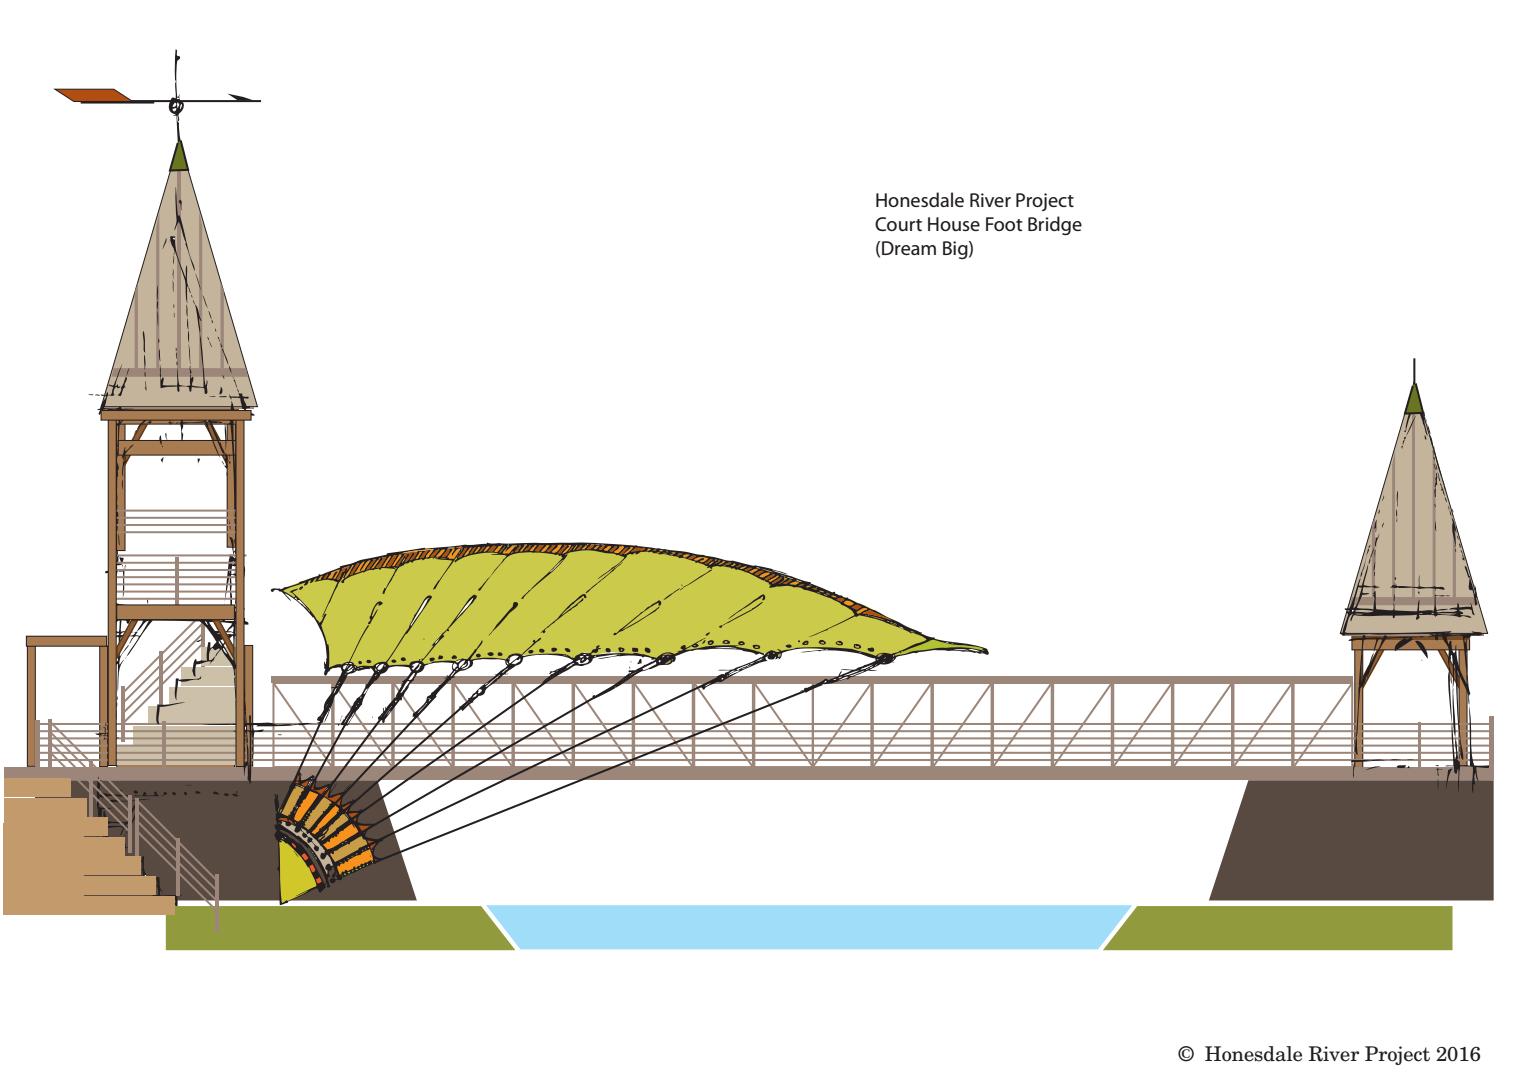 Footbridge-hrp-1.png